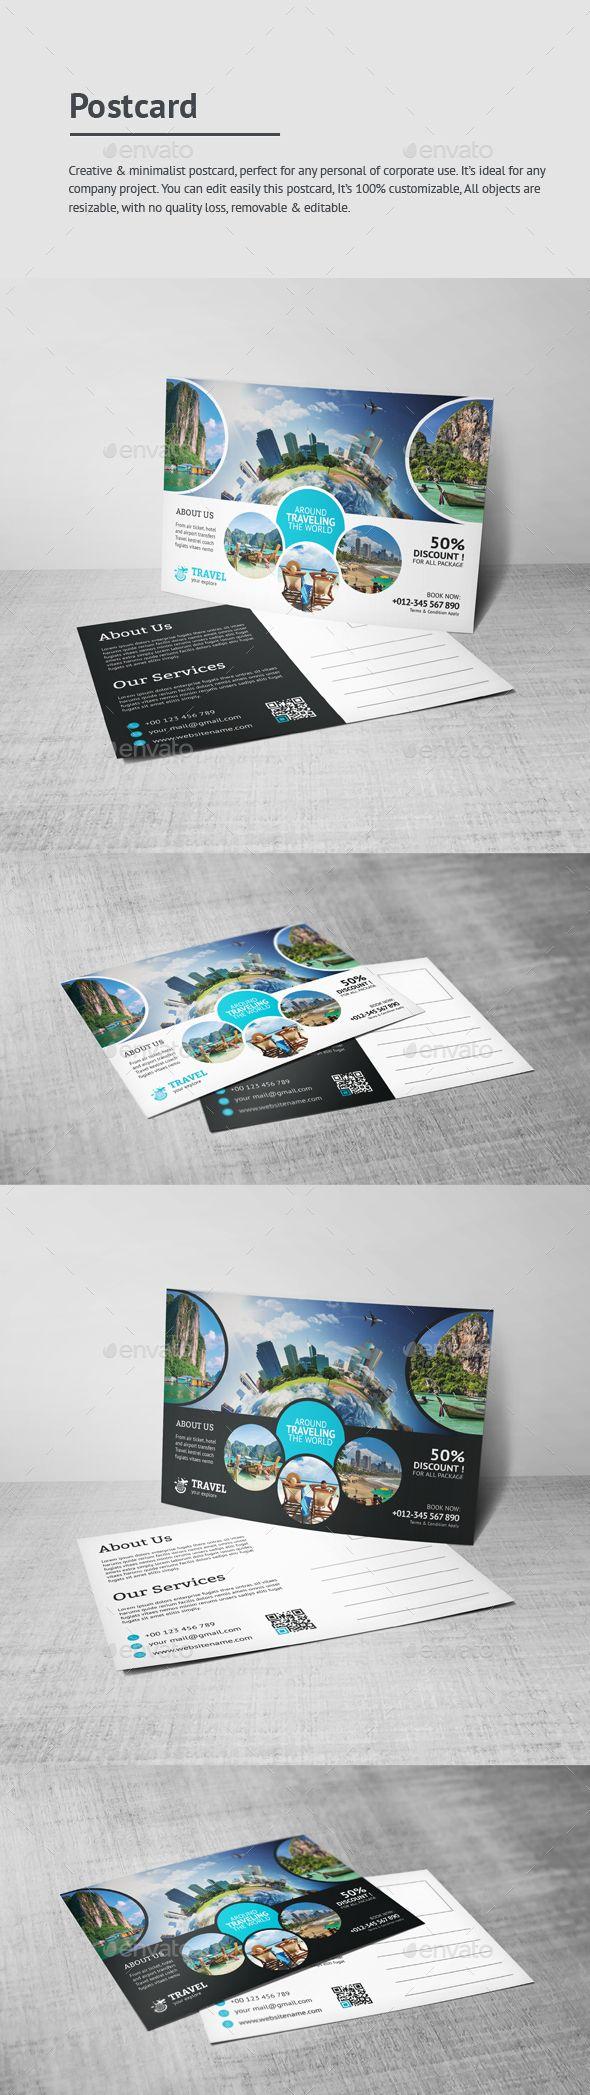 postcard template psd